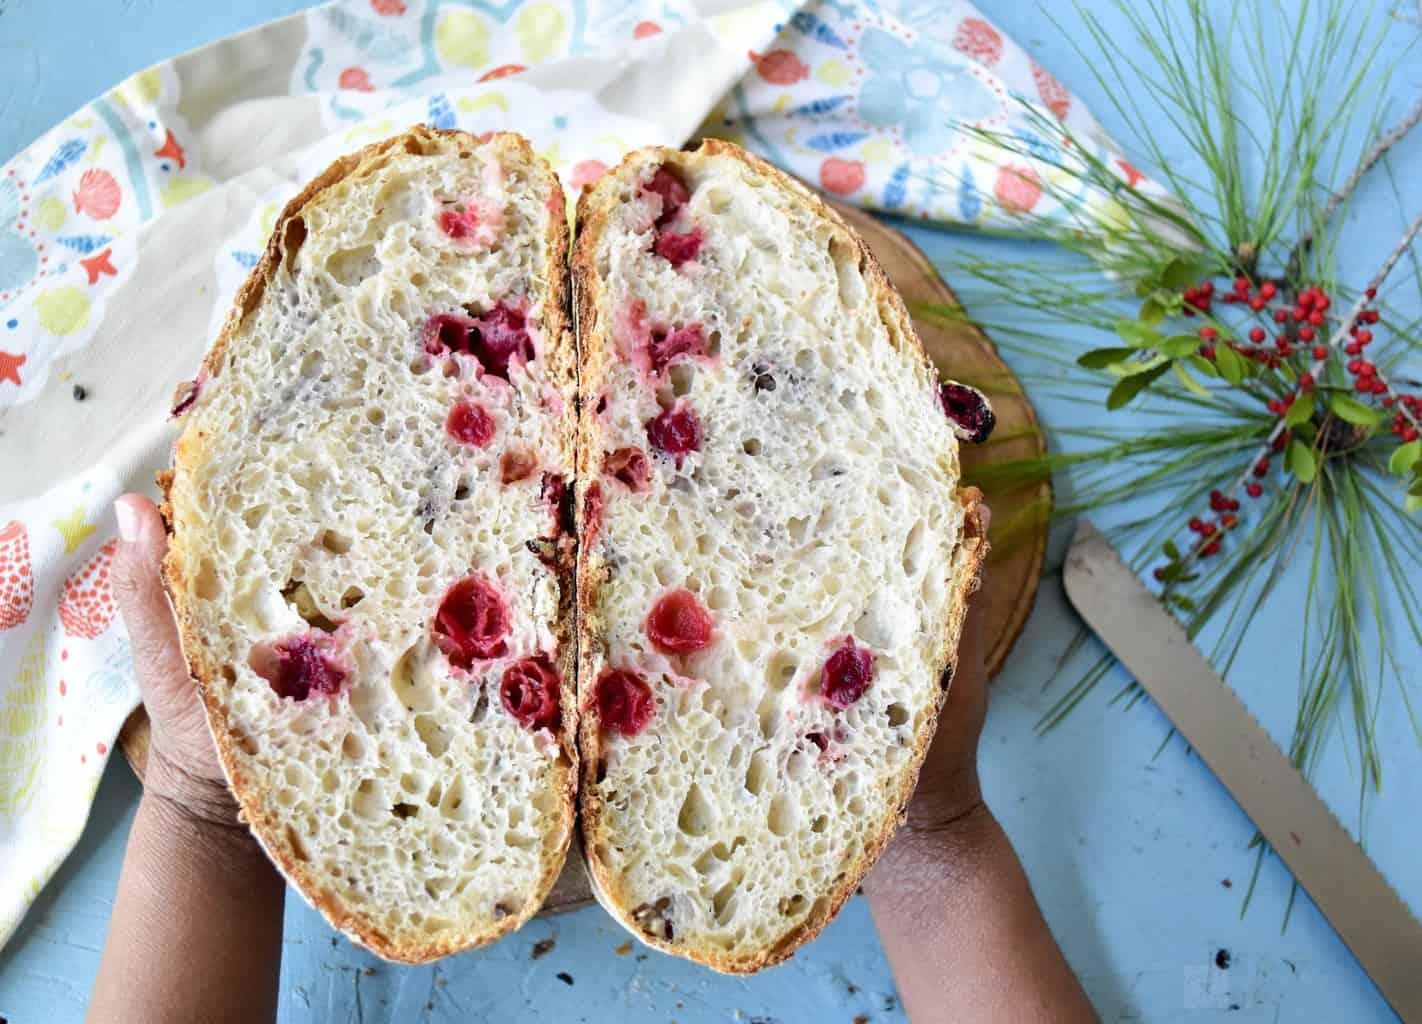 "<img src=""https://cdn.shortpixel.ai/client/q_glossy,ret_img,w_4096,h_2950/Cranberry Pecan Sourdough Bread .jpg"" alt="" Two slices of Cranberry Pecan Sourdough Bread "">"